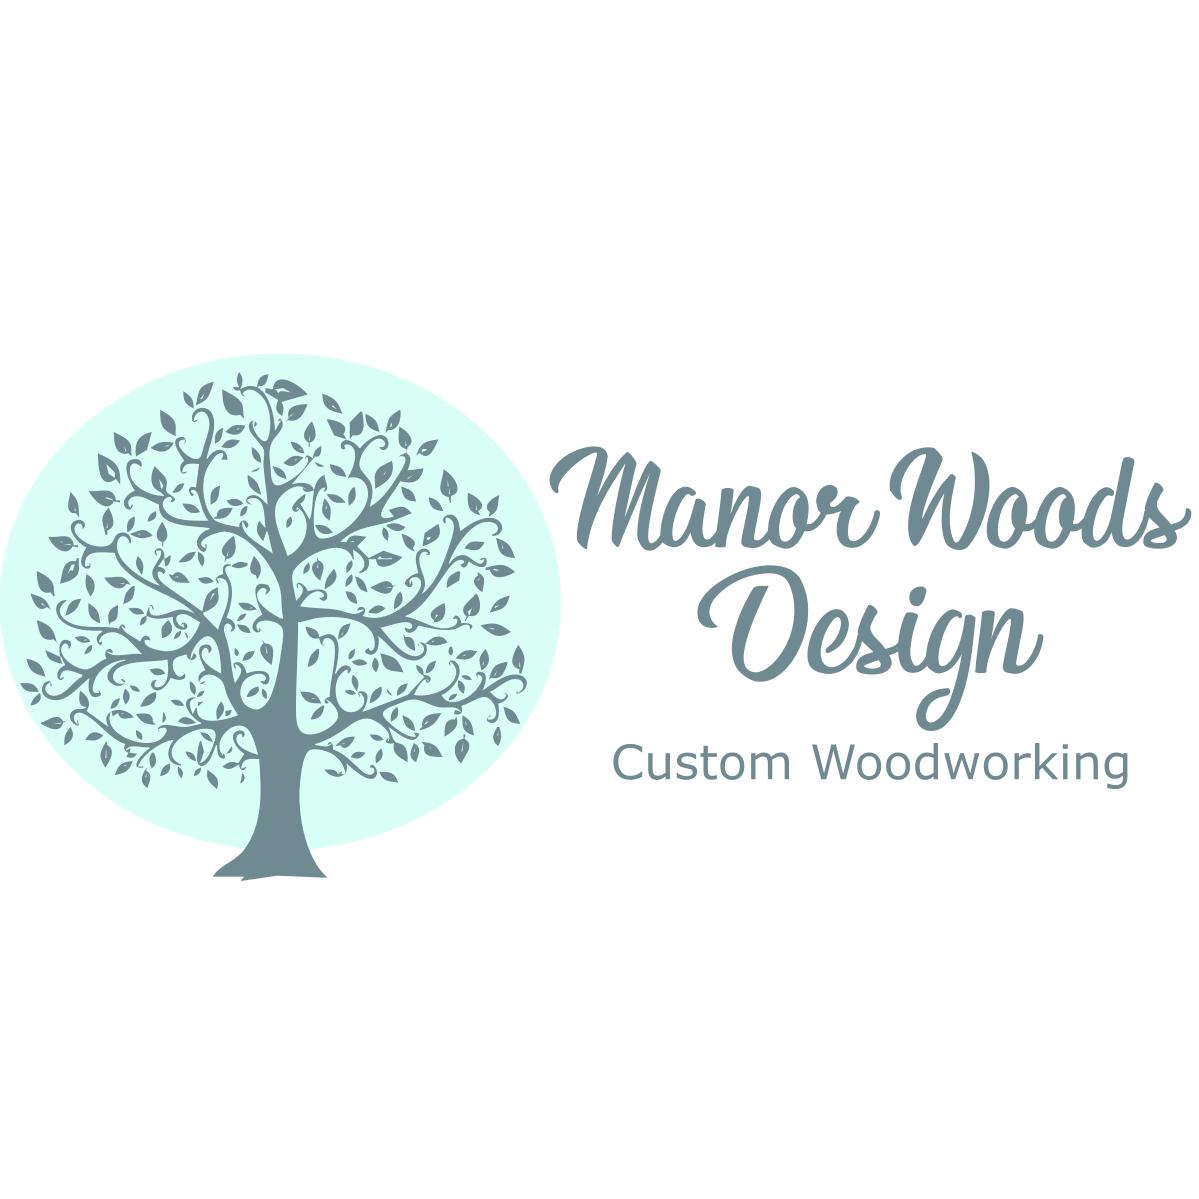 Manor Woods Design